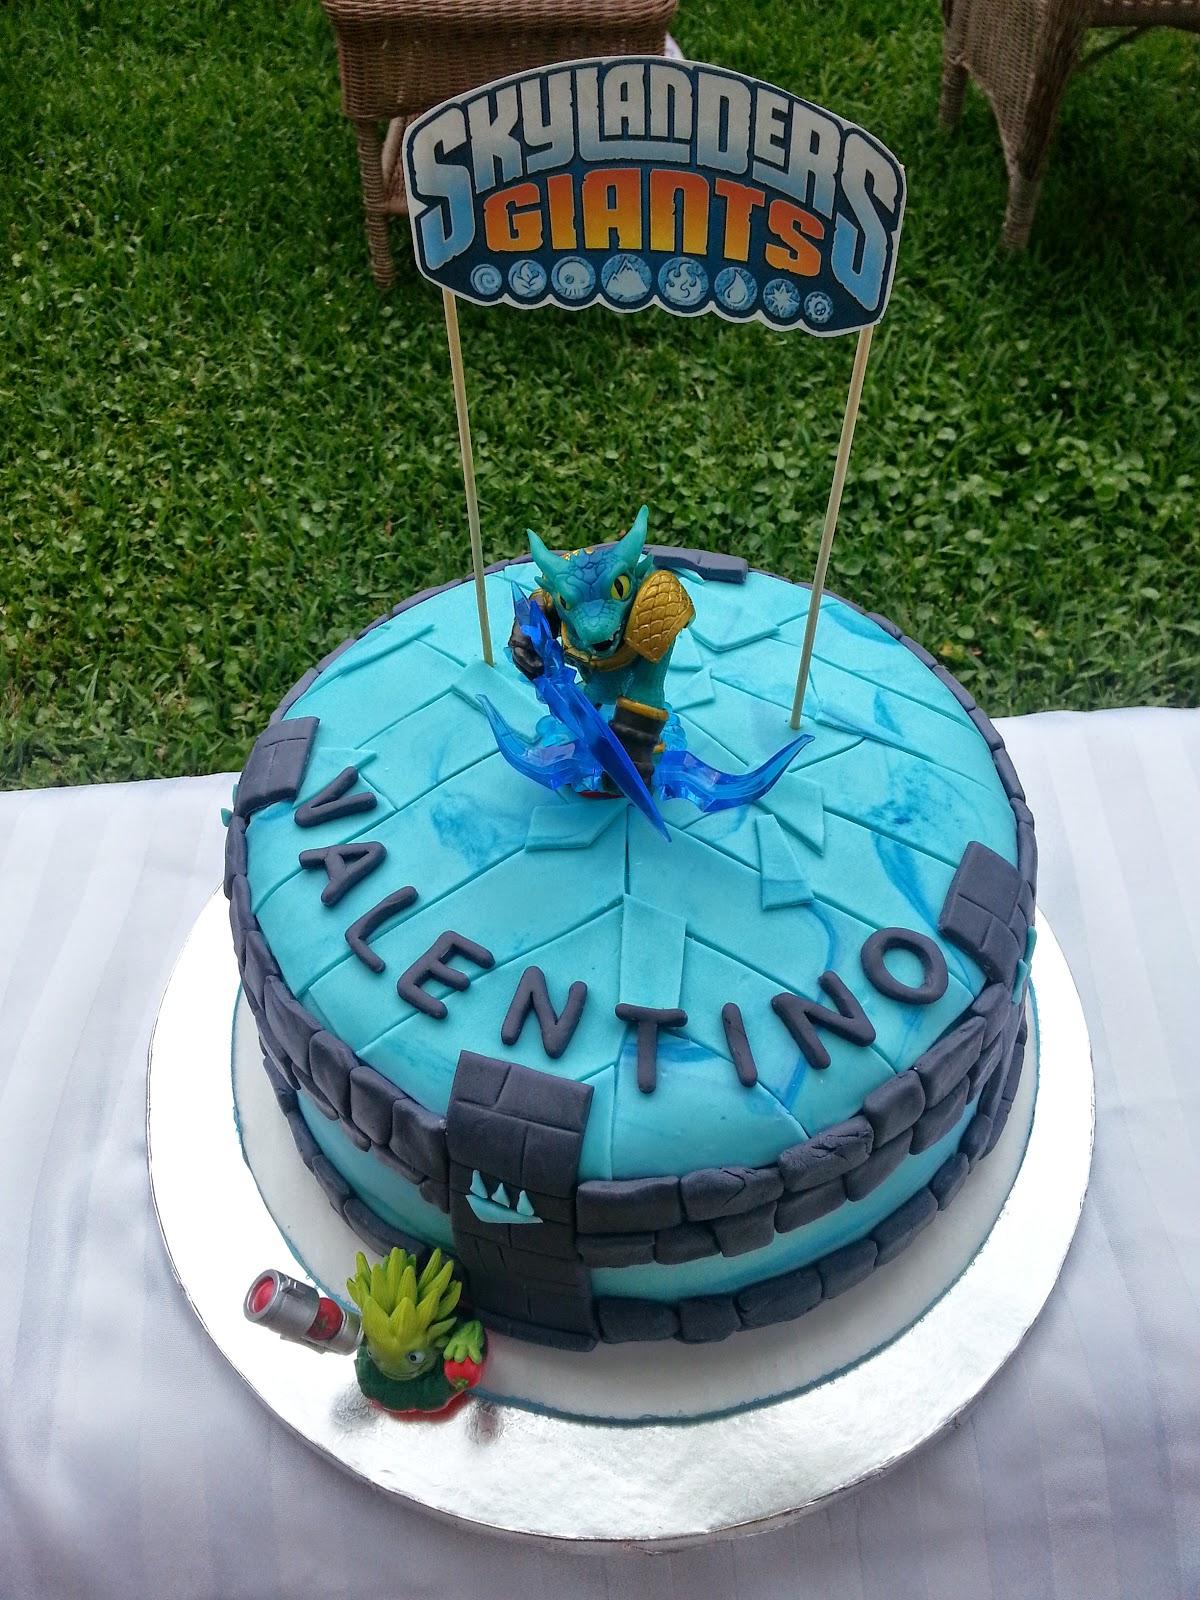 Nana S Theme Party Quot Skylanders Giants Birthday Cake